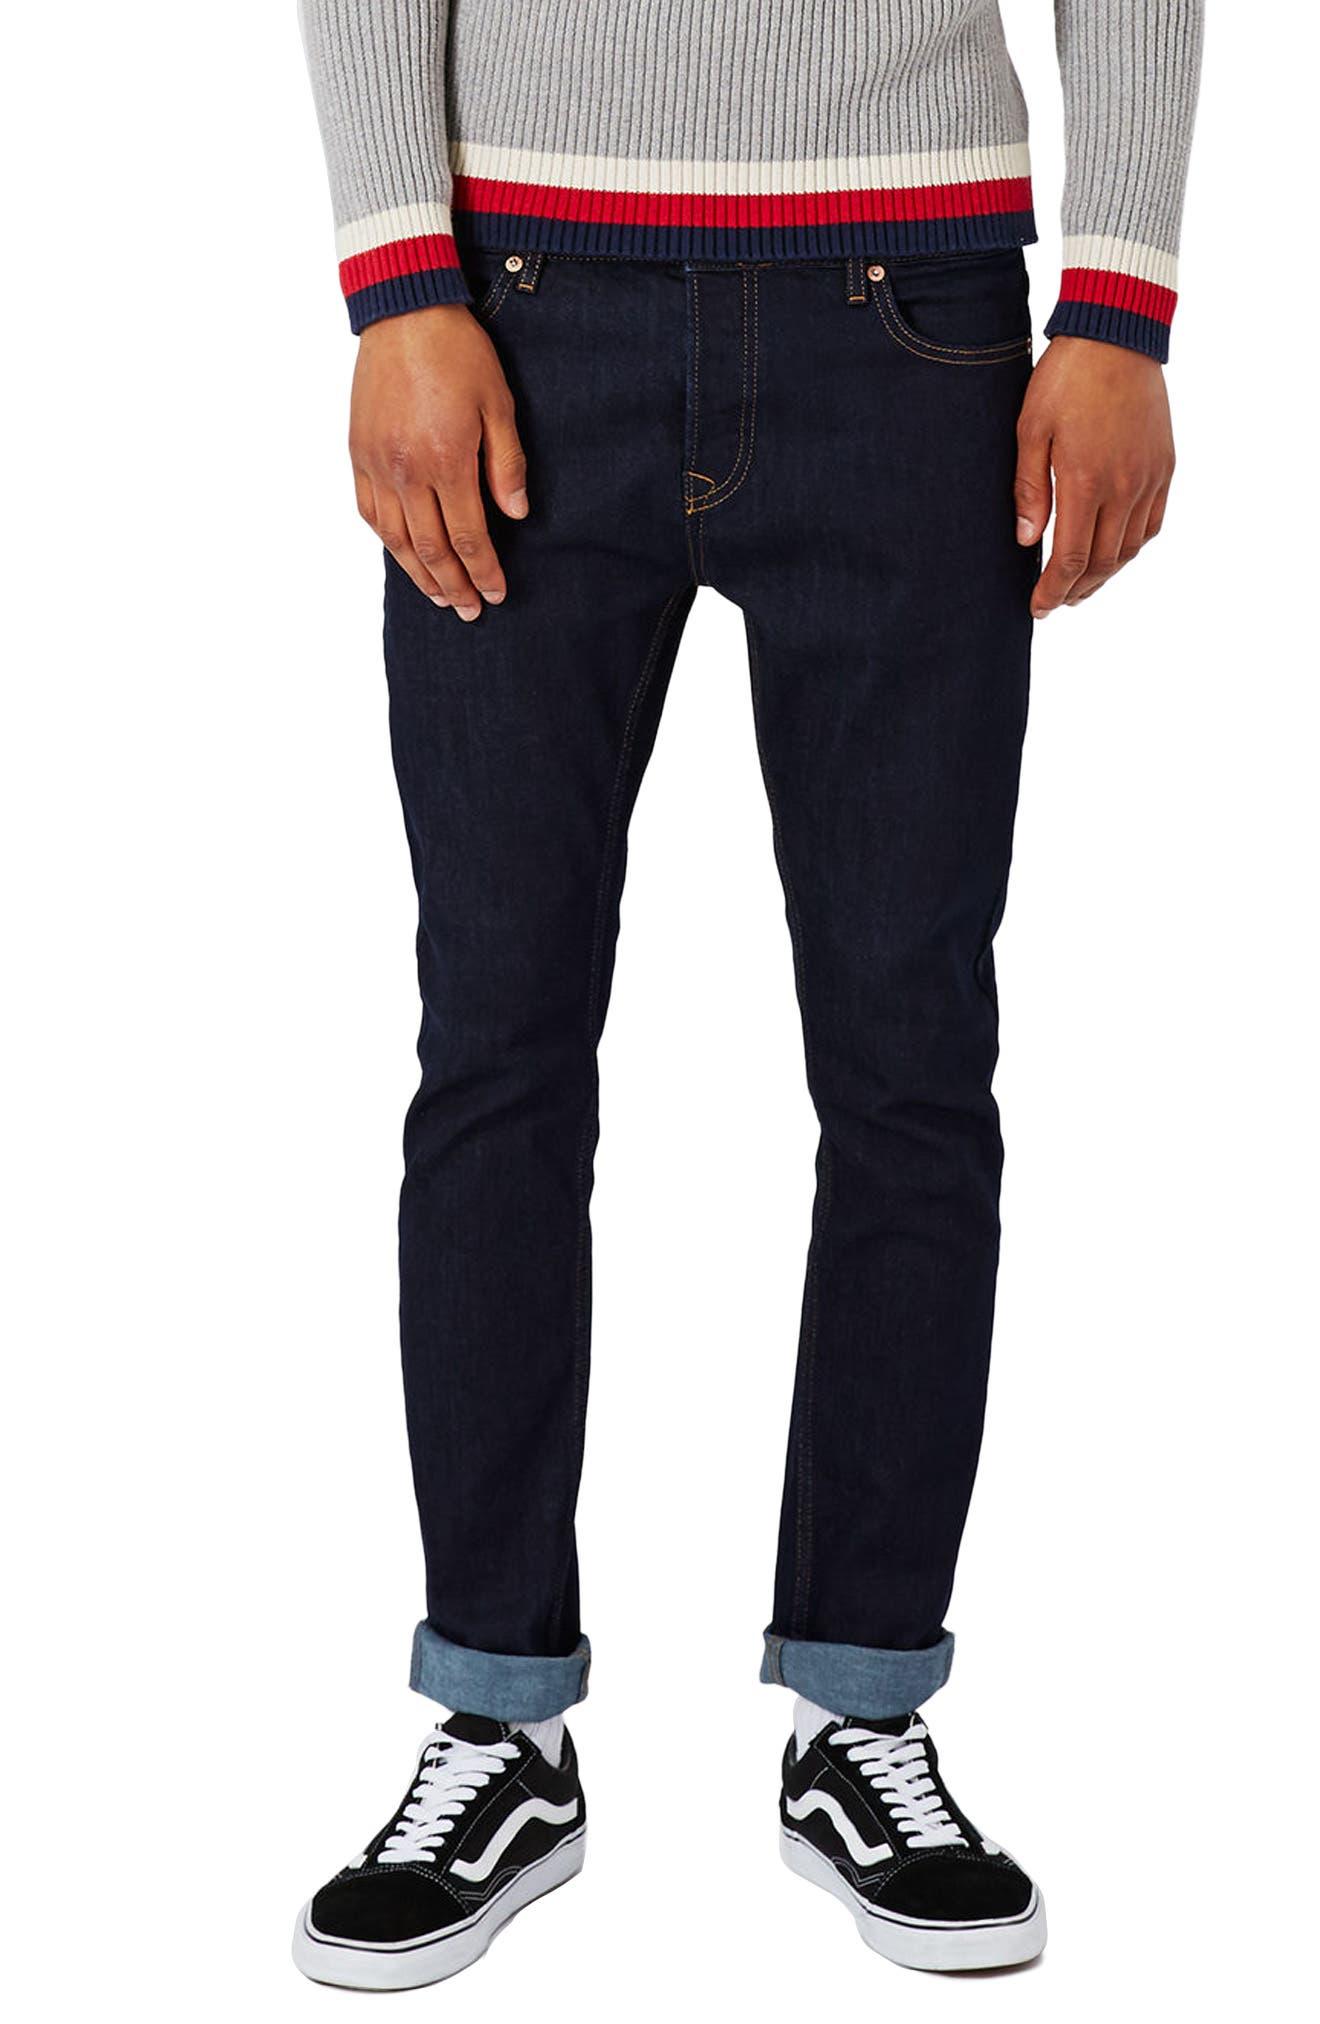 TOPMAN, Stretch Skinny Fit Raw Denim Jeans, Main thumbnail 1, color, BLUE